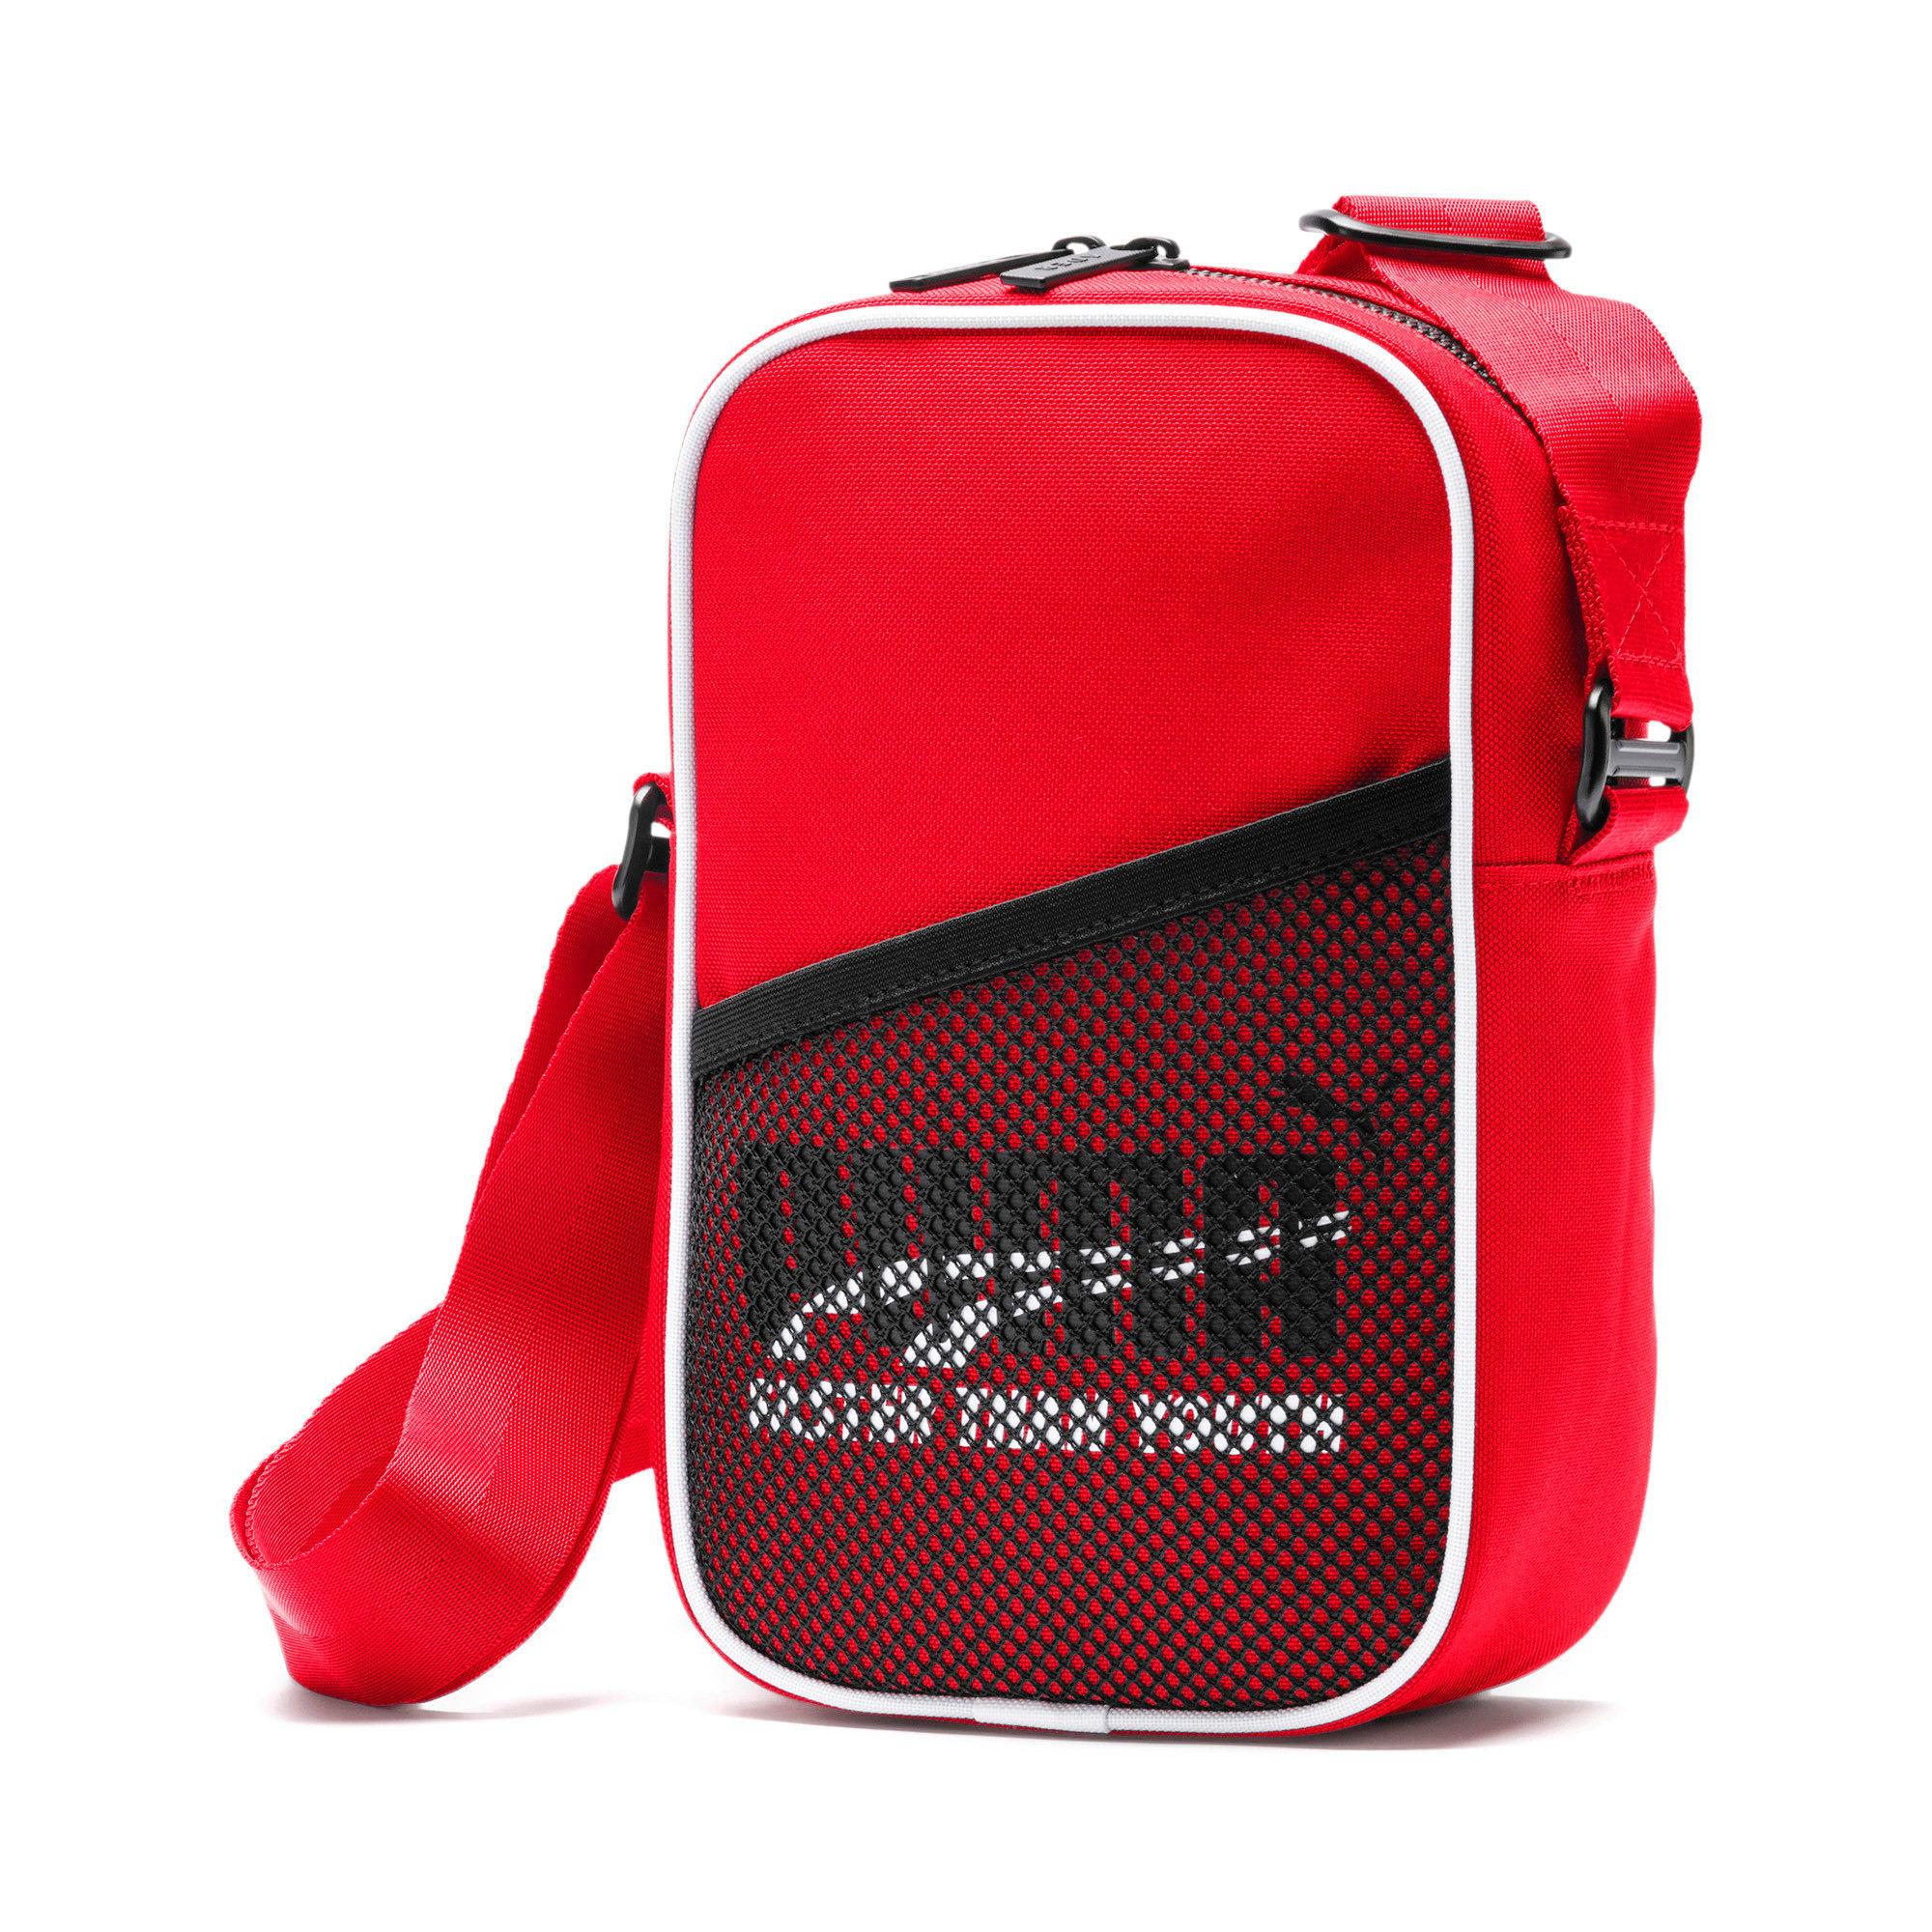 Thumbnail 1 of PUMA x ADER ERROR Portable Bag, Puma Red, medium